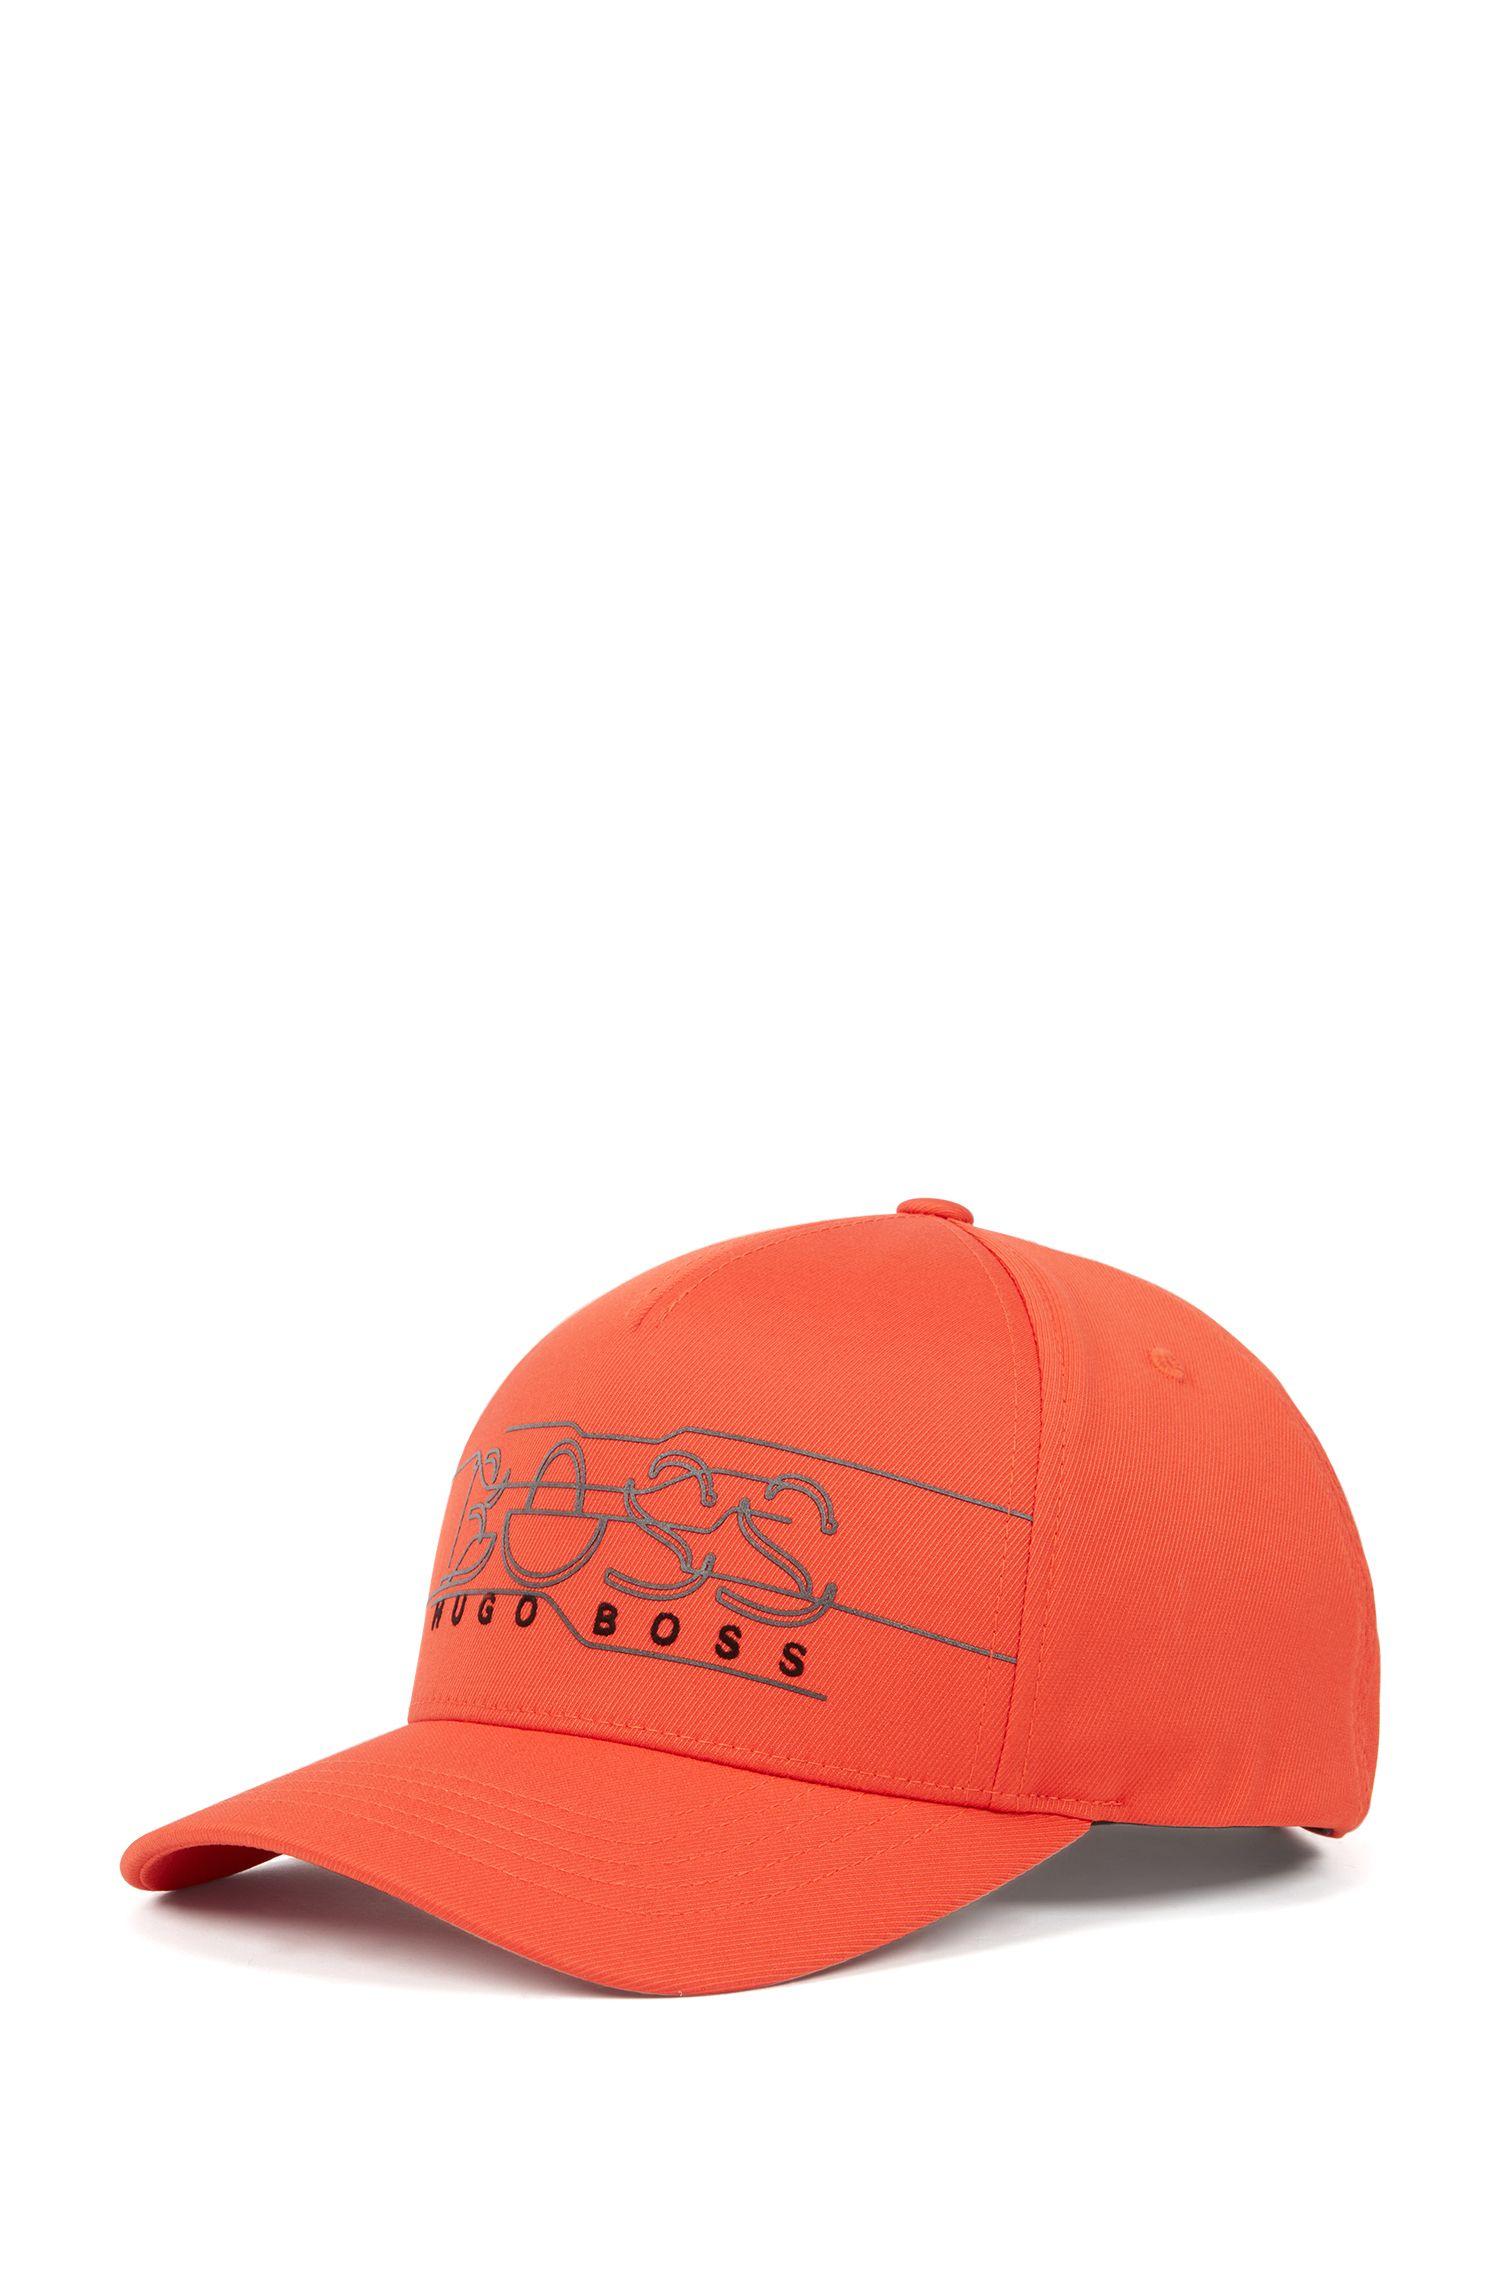 Double-twill cap with reflective logo print, Orange